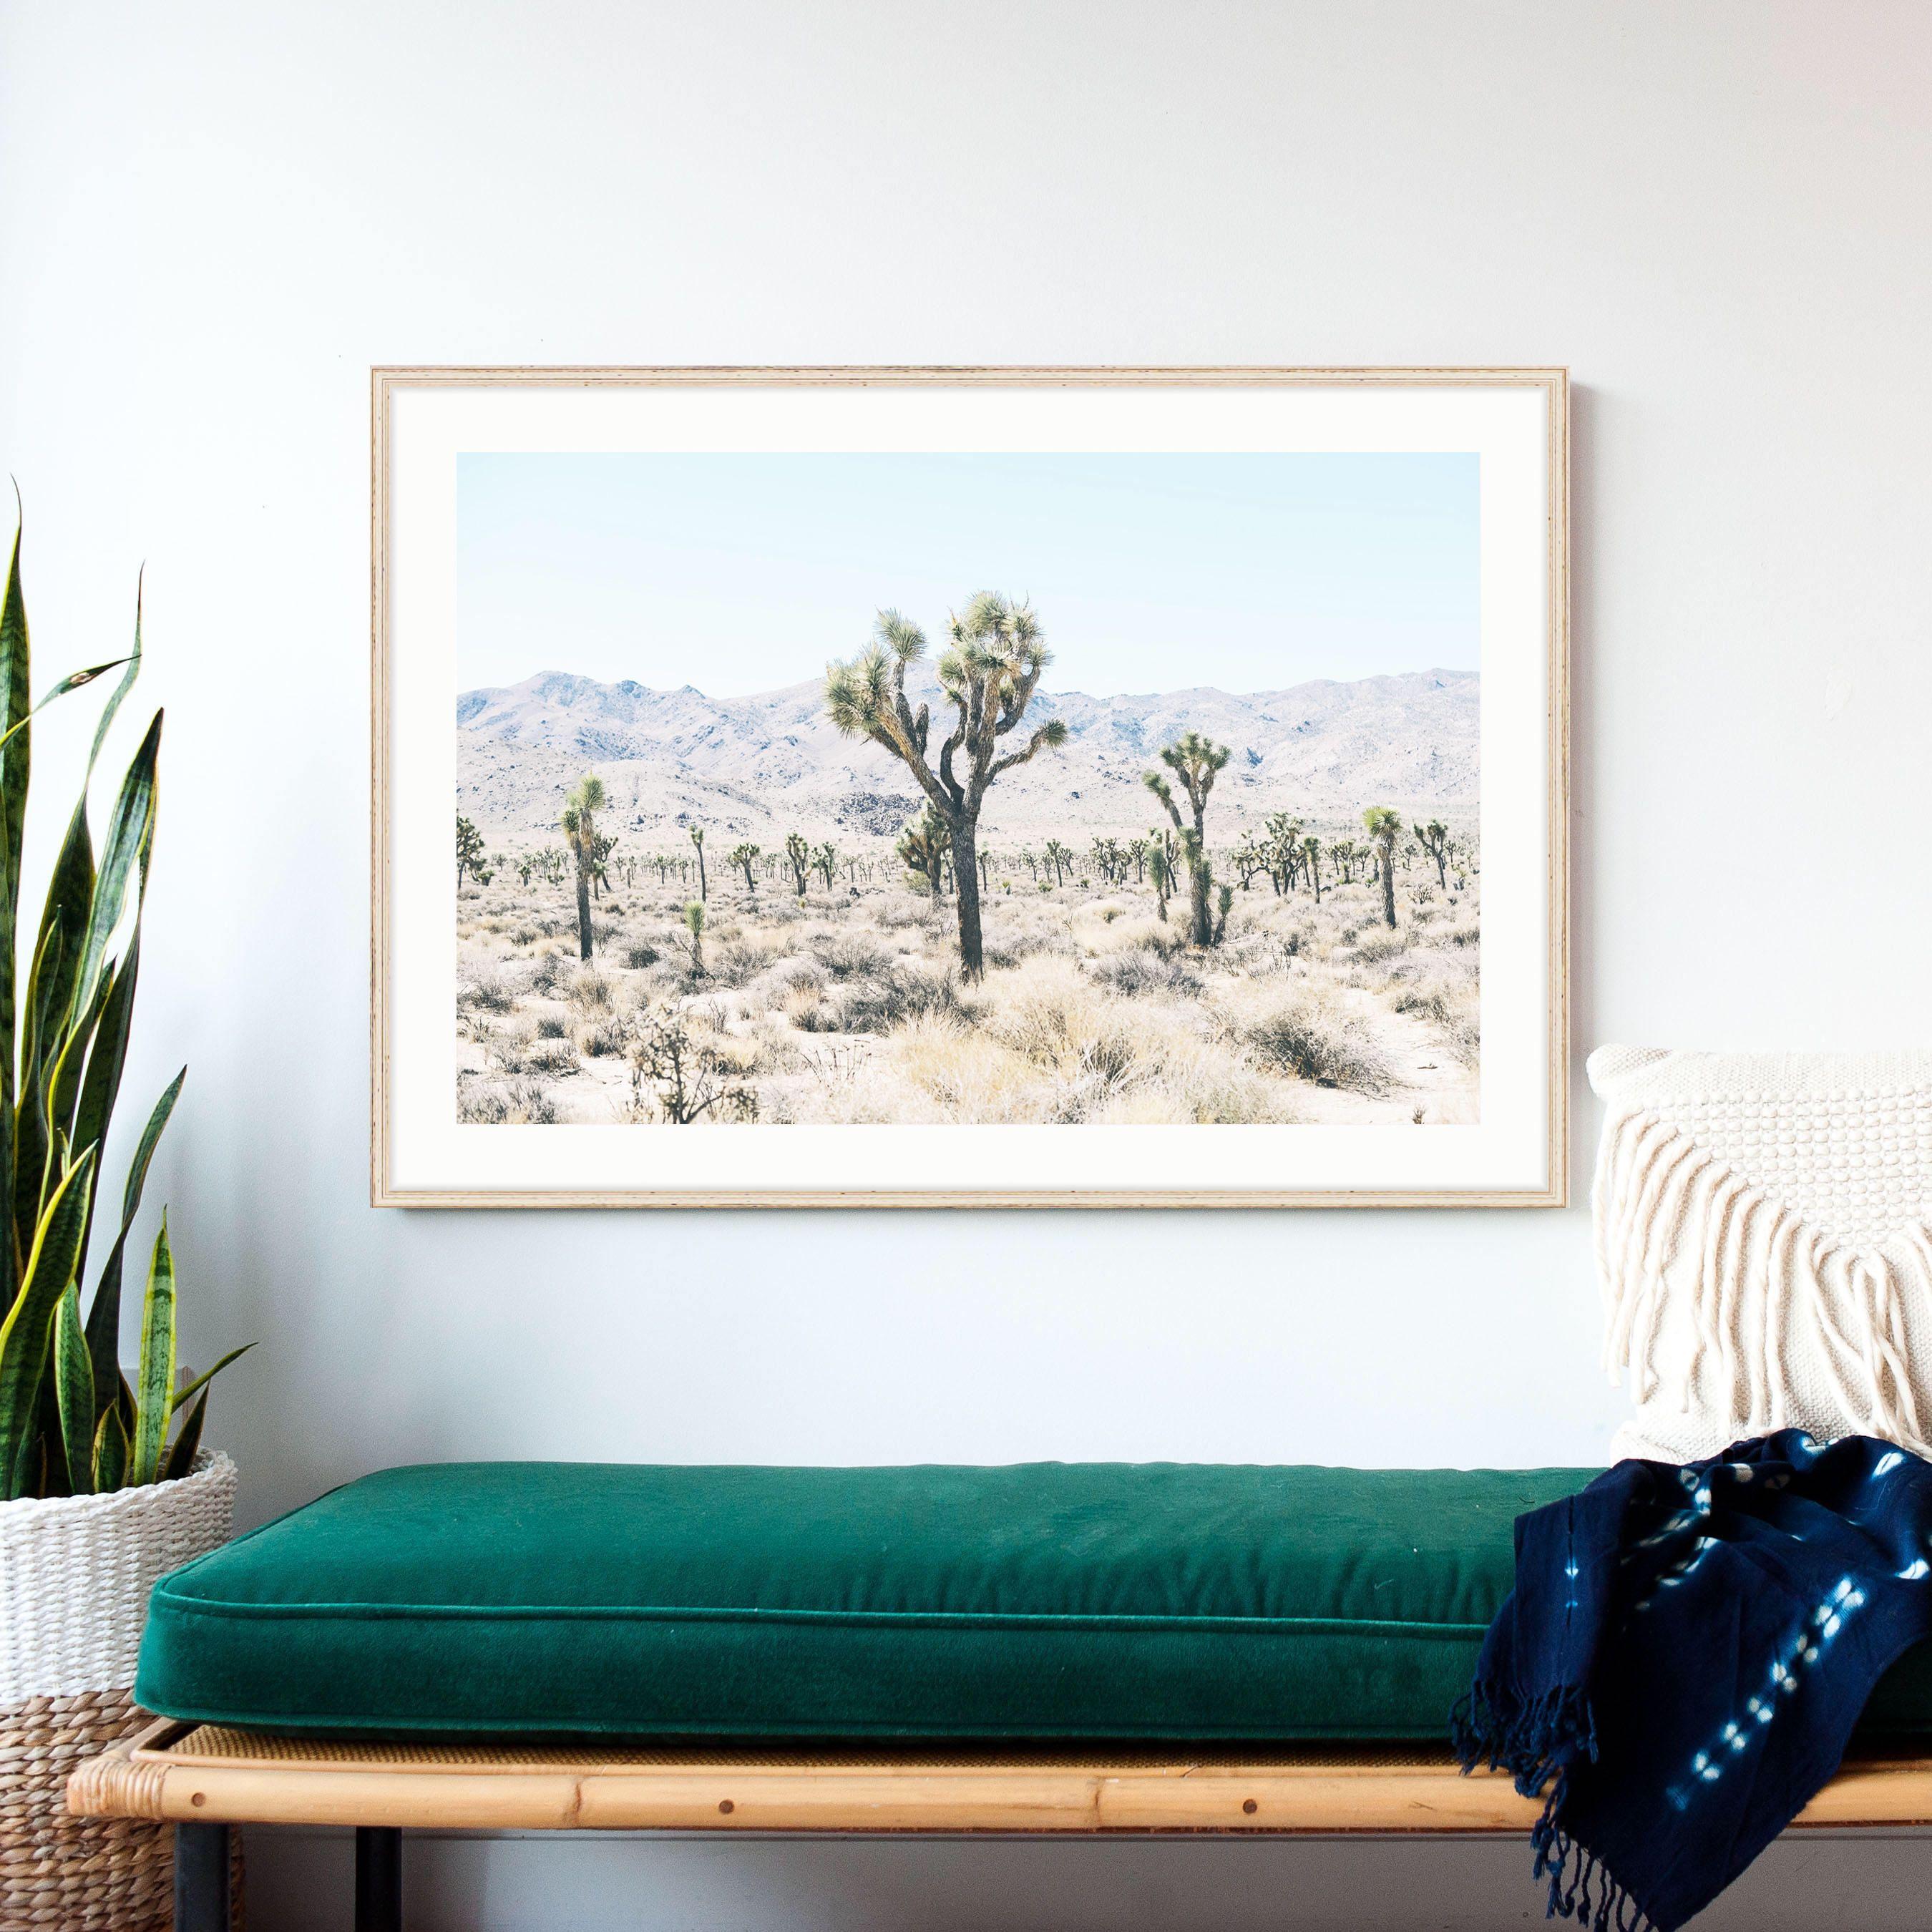 Photography Prints, Cactus Prints, Desert Photography, Nature Prints, Boho  Decor, Desert Wall Art, Nature Wall Art, Desert Decor, Landscape